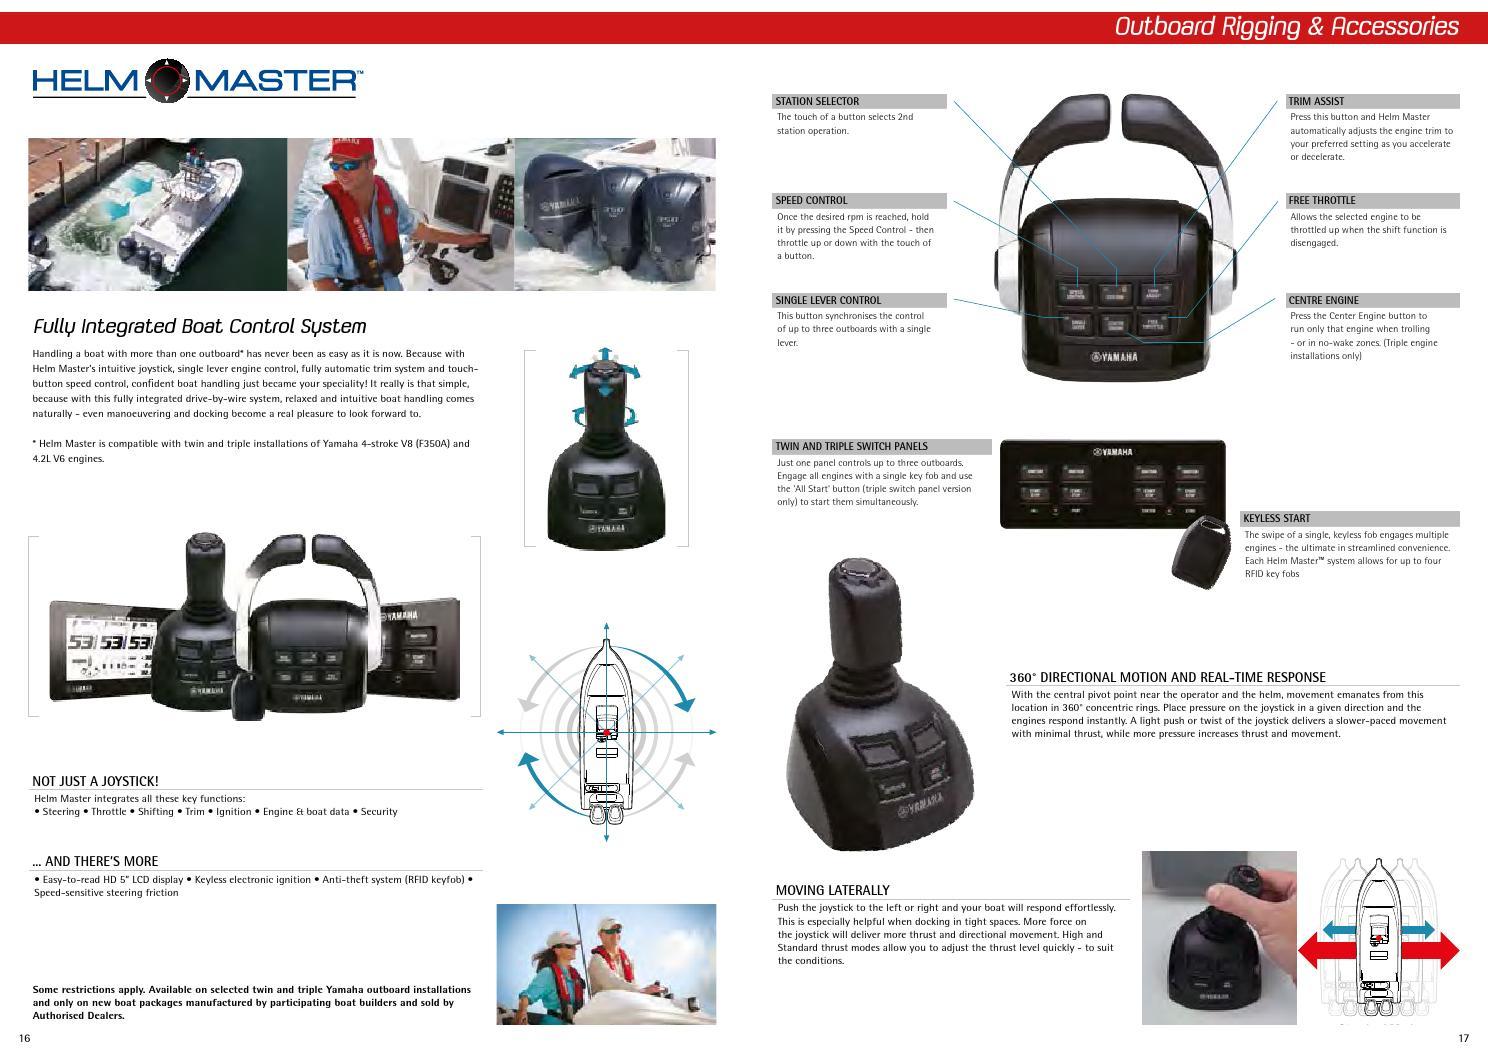 Yamaha marine accessories catalogue web by René Olsen - issuu